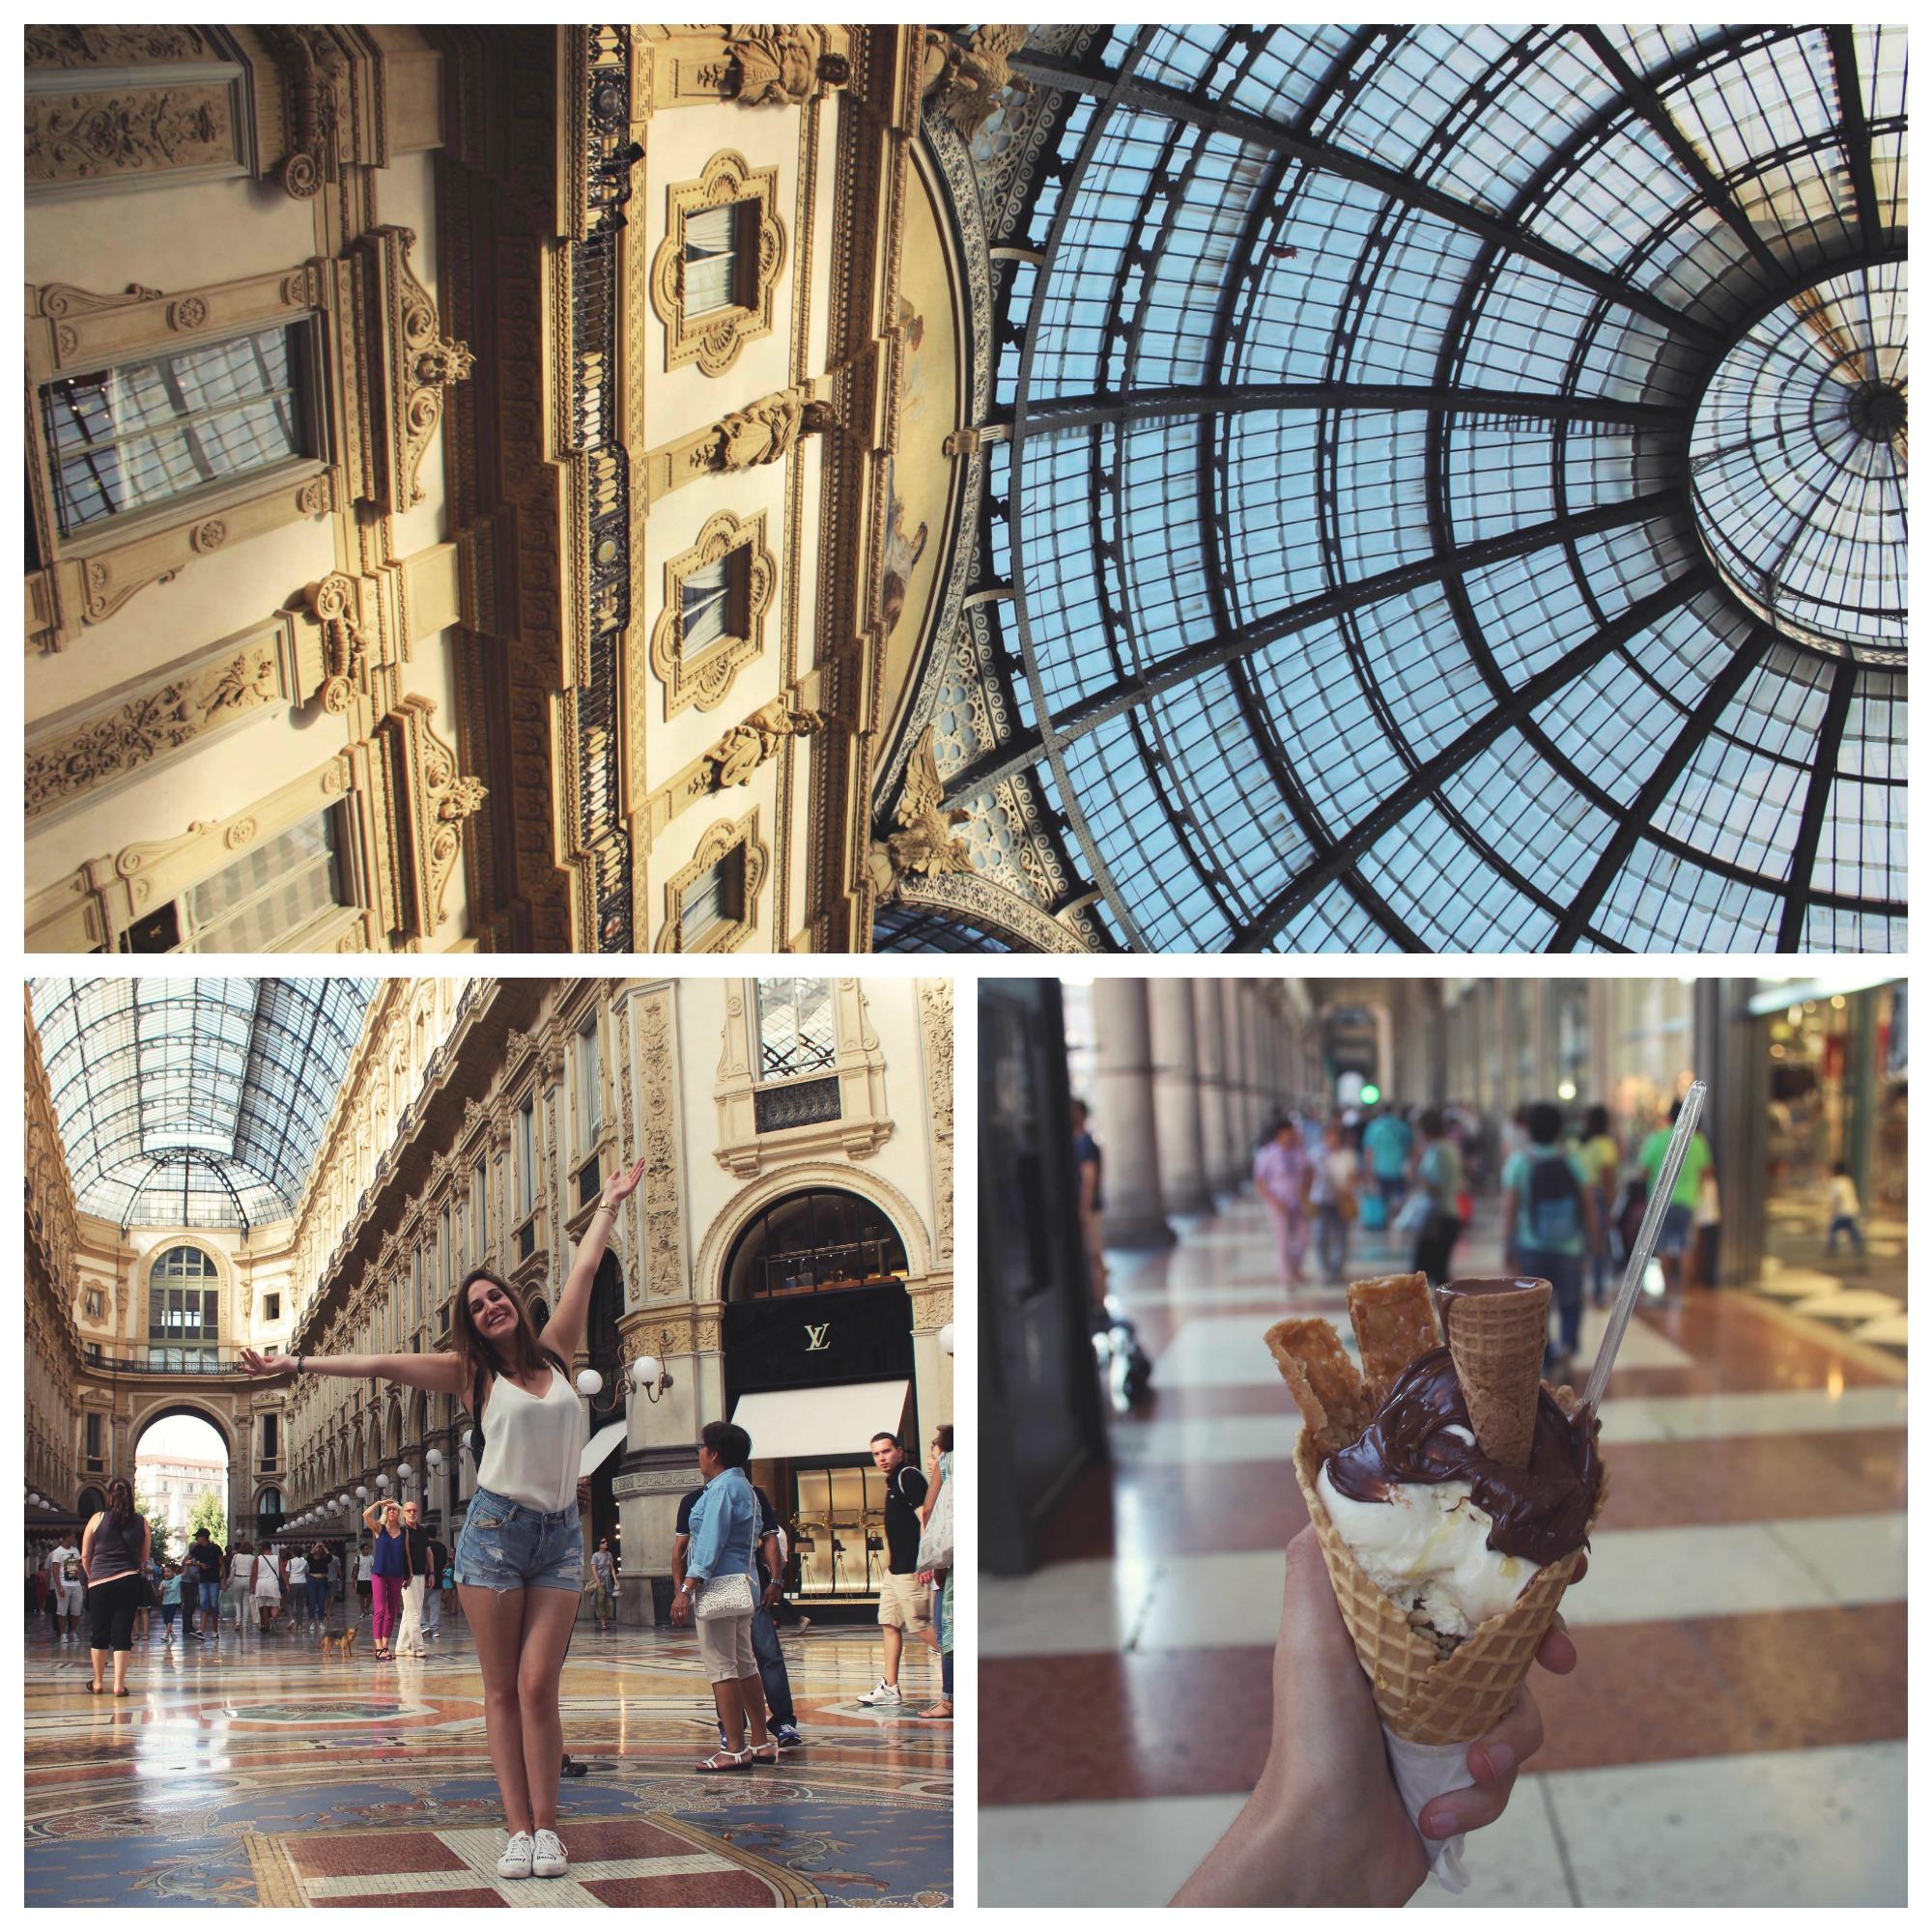 city trip à milan : a voir galleria vittorio emmanuele